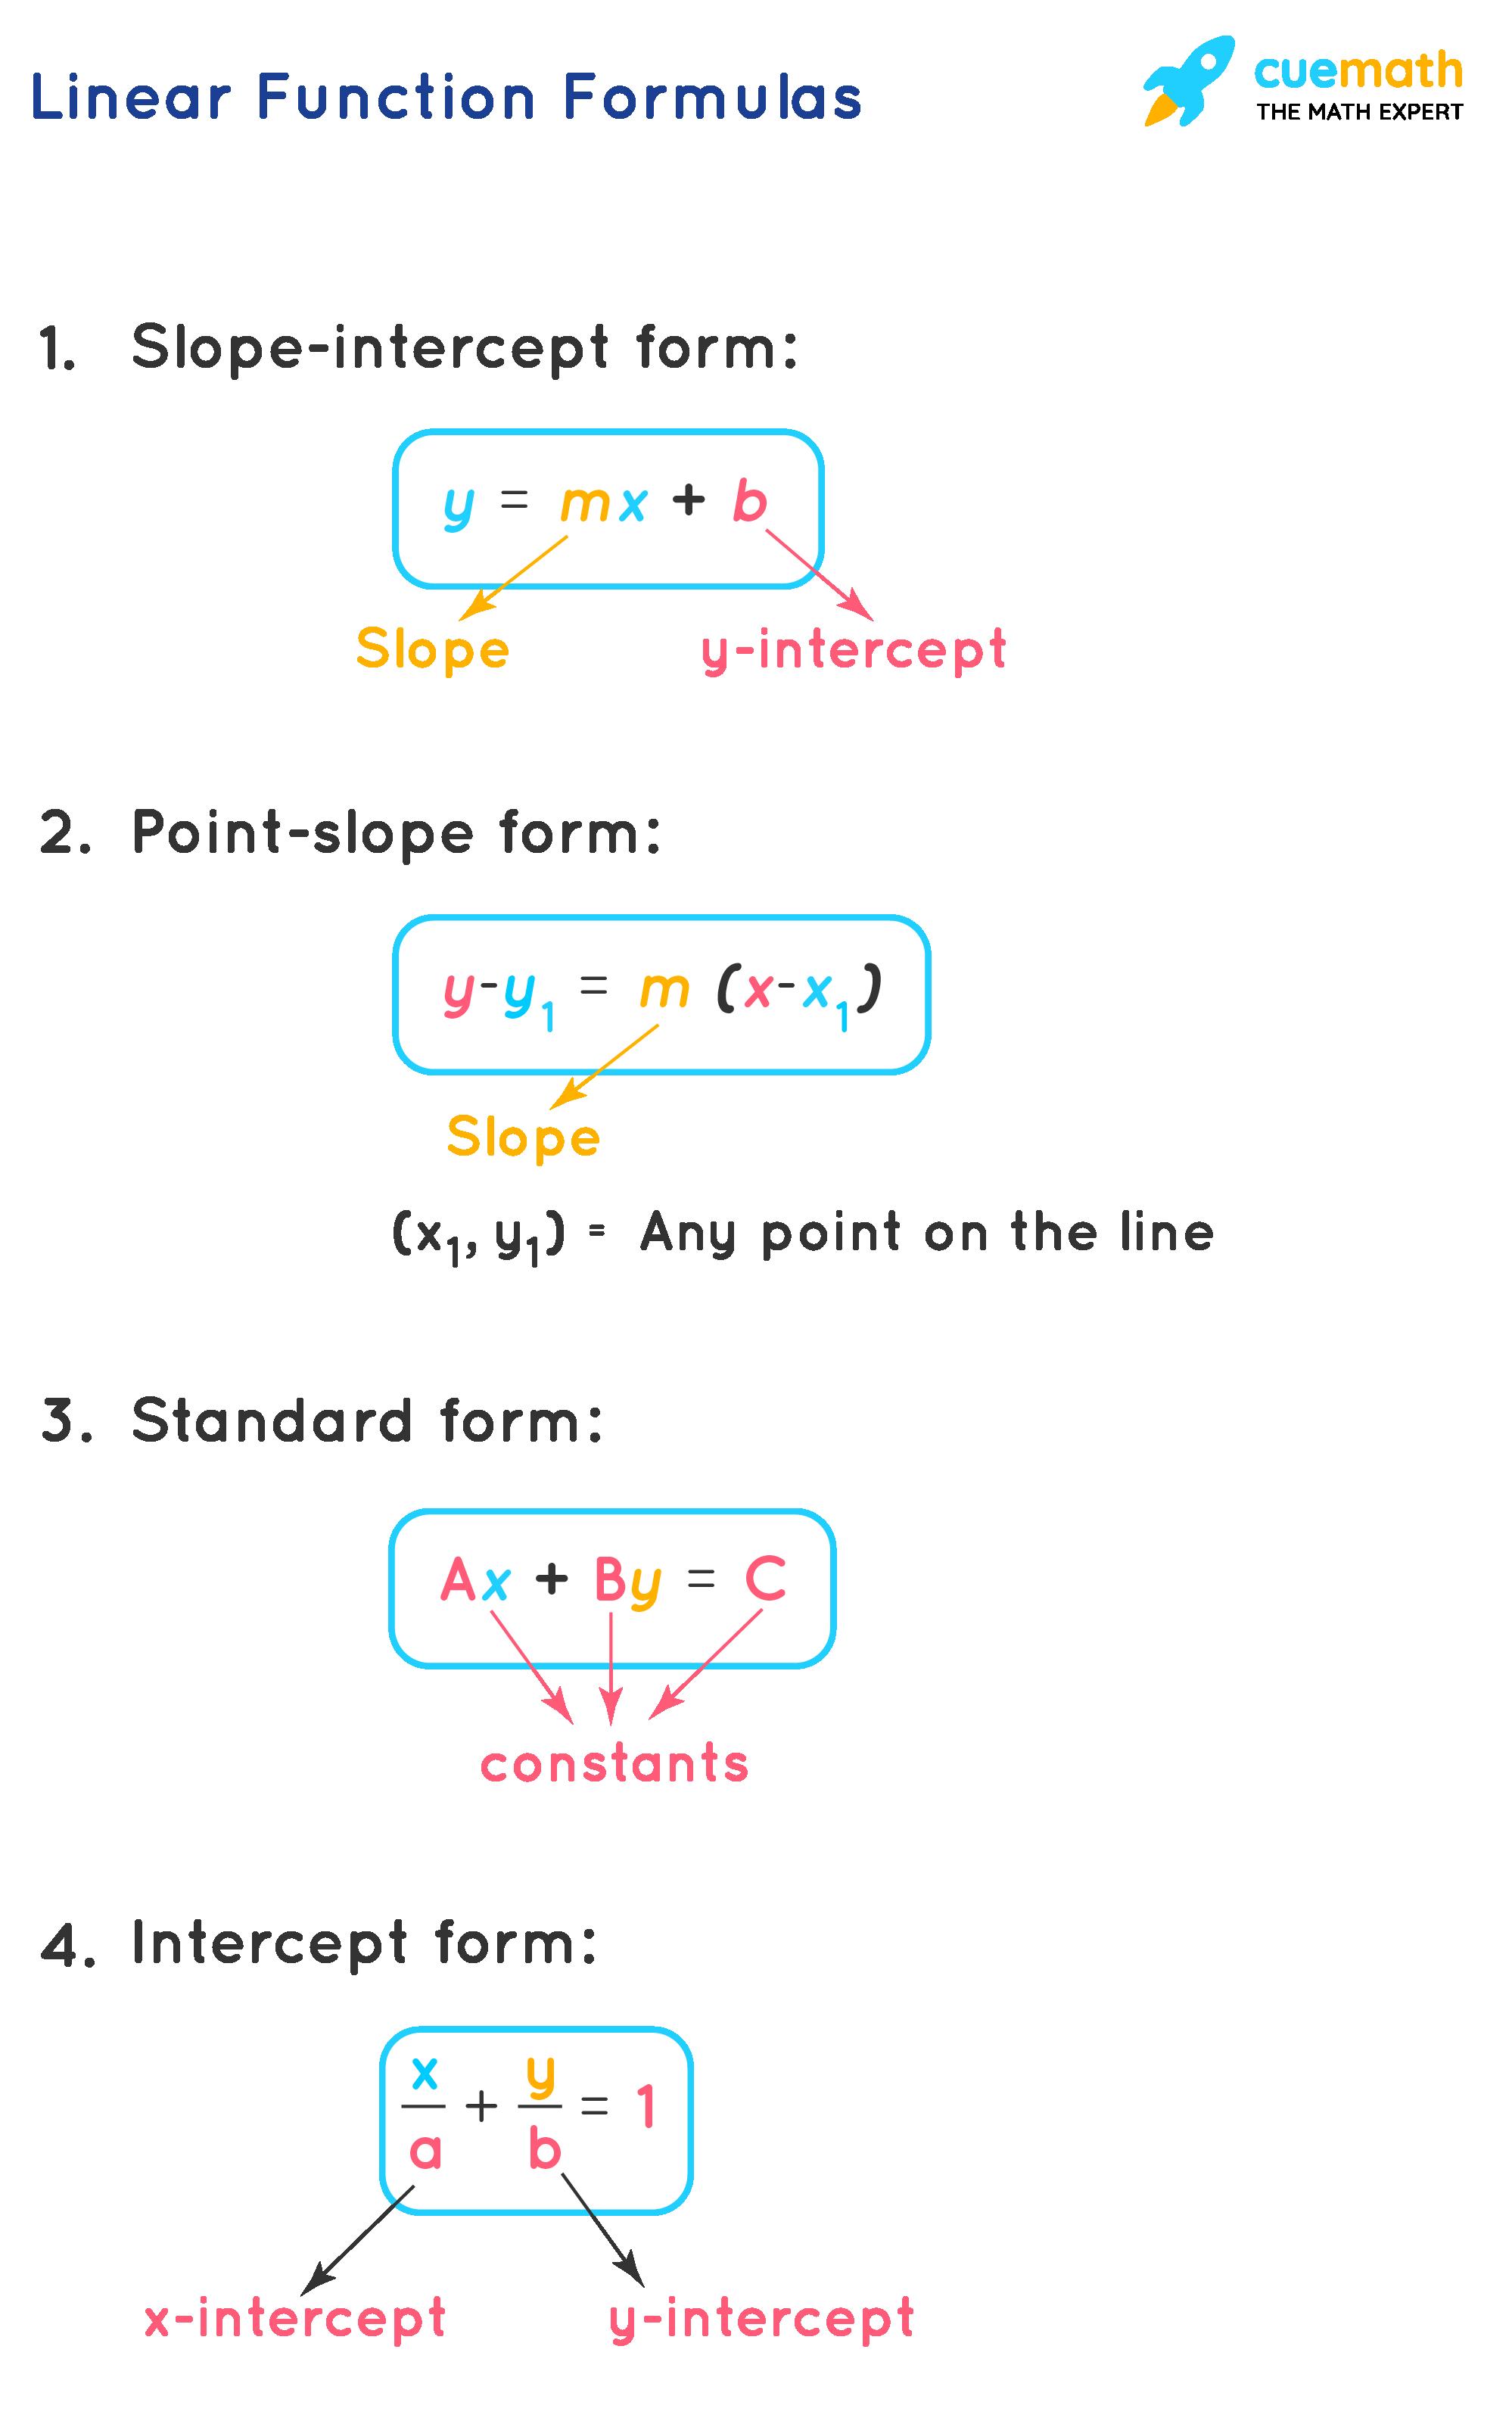 Linear function formulas